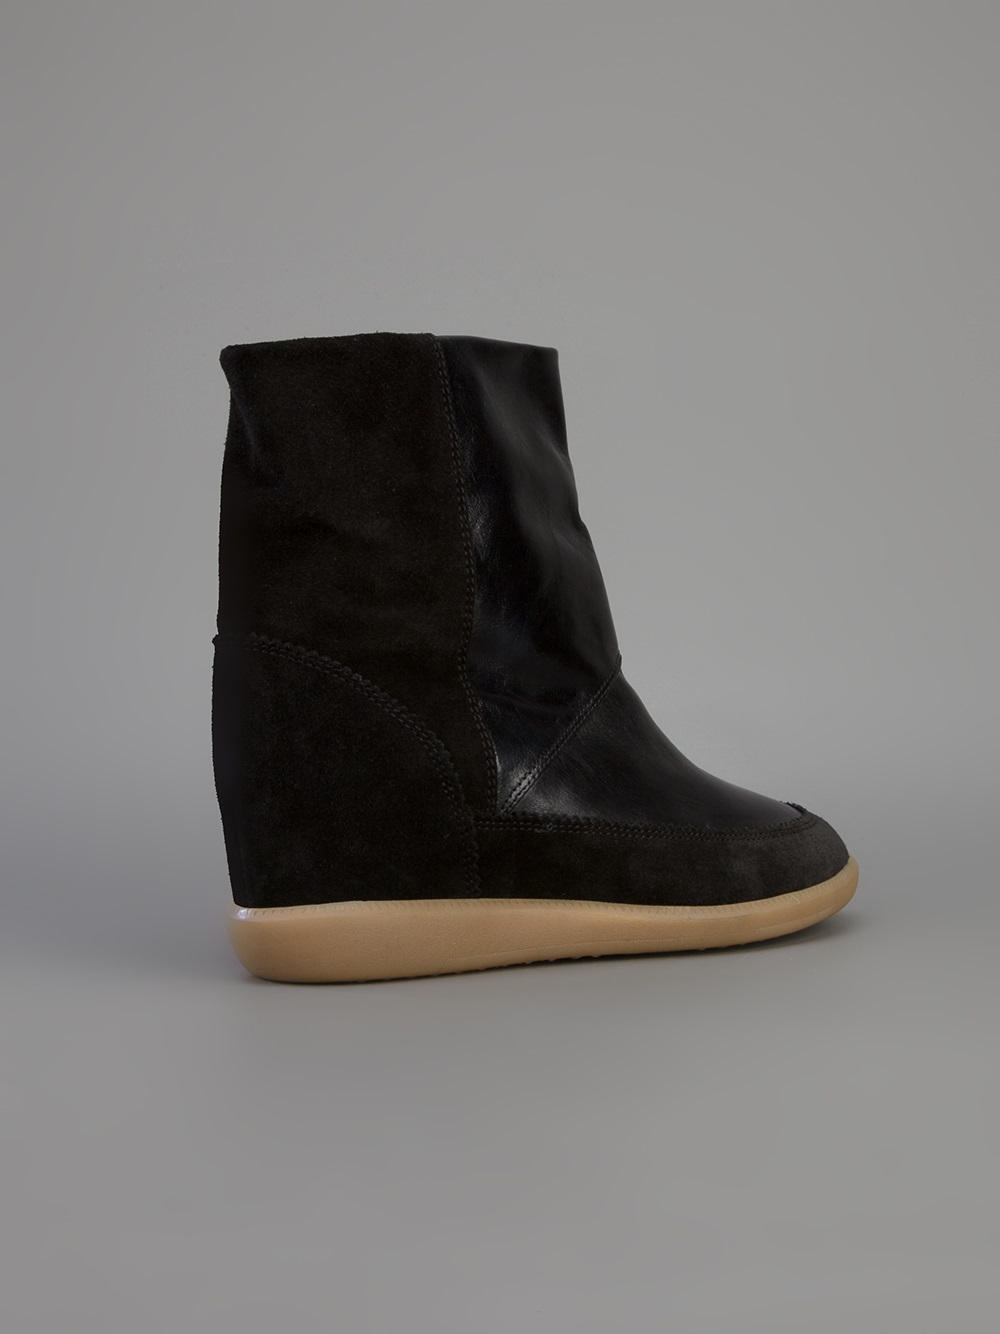 toile isabel marant nuty boot in black lyst. Black Bedroom Furniture Sets. Home Design Ideas